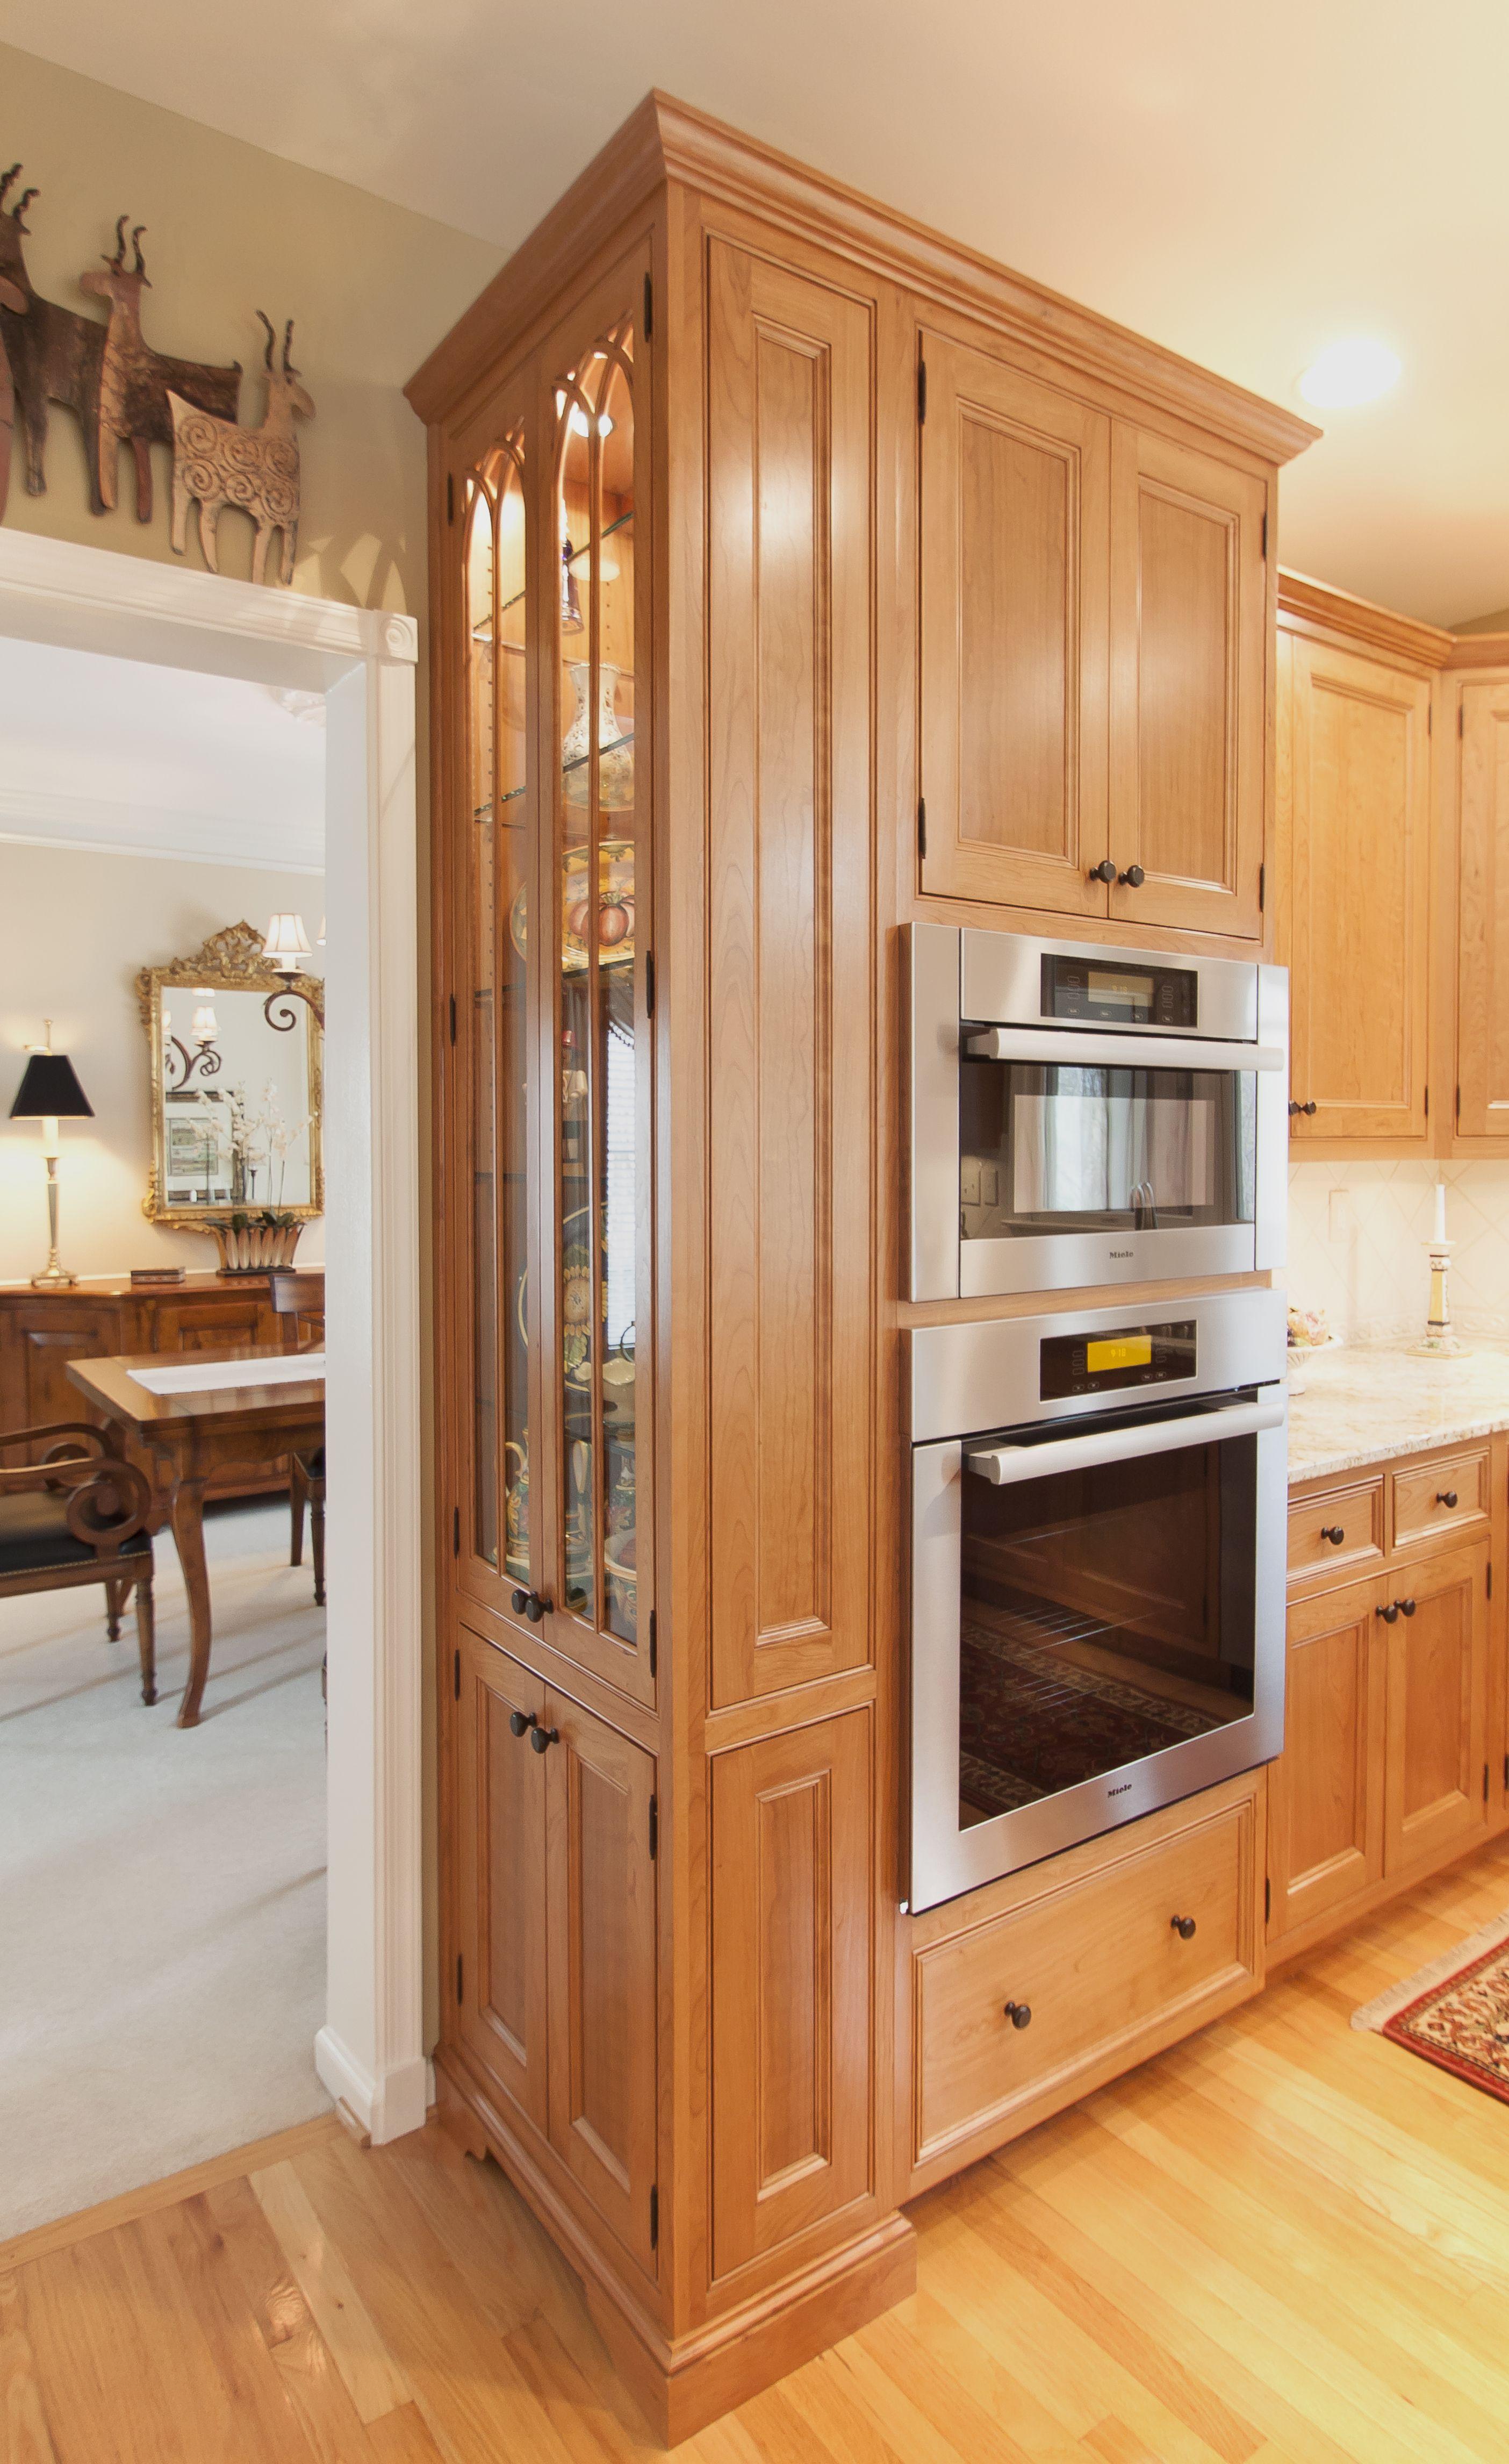 Cherry Wood With Nutmeg Finish Cherry Wood Kitchens Cherry Wood Cabinets Kitchen